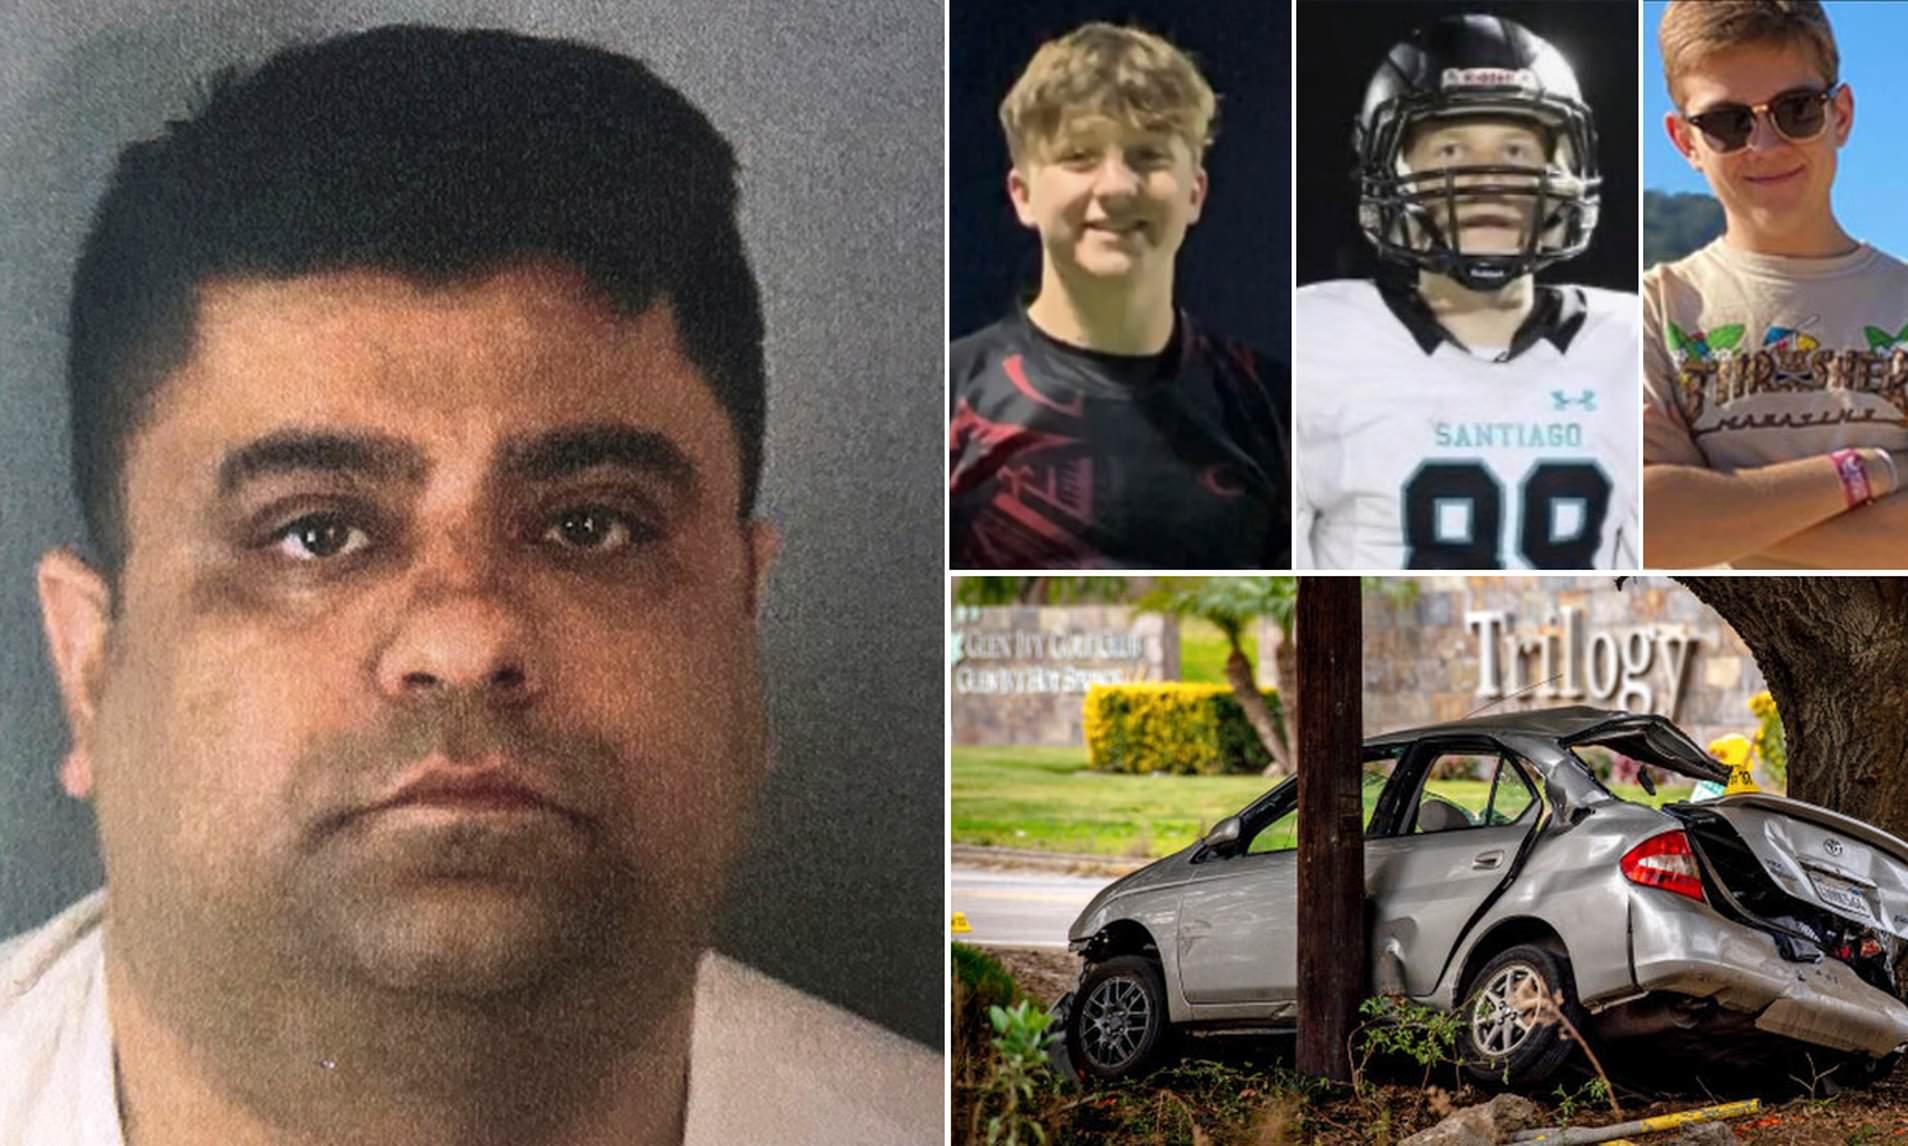 Teens rang a man's doorbell as a prank. Then he rammed their car, killing 3 of them, authorities say - KVIA